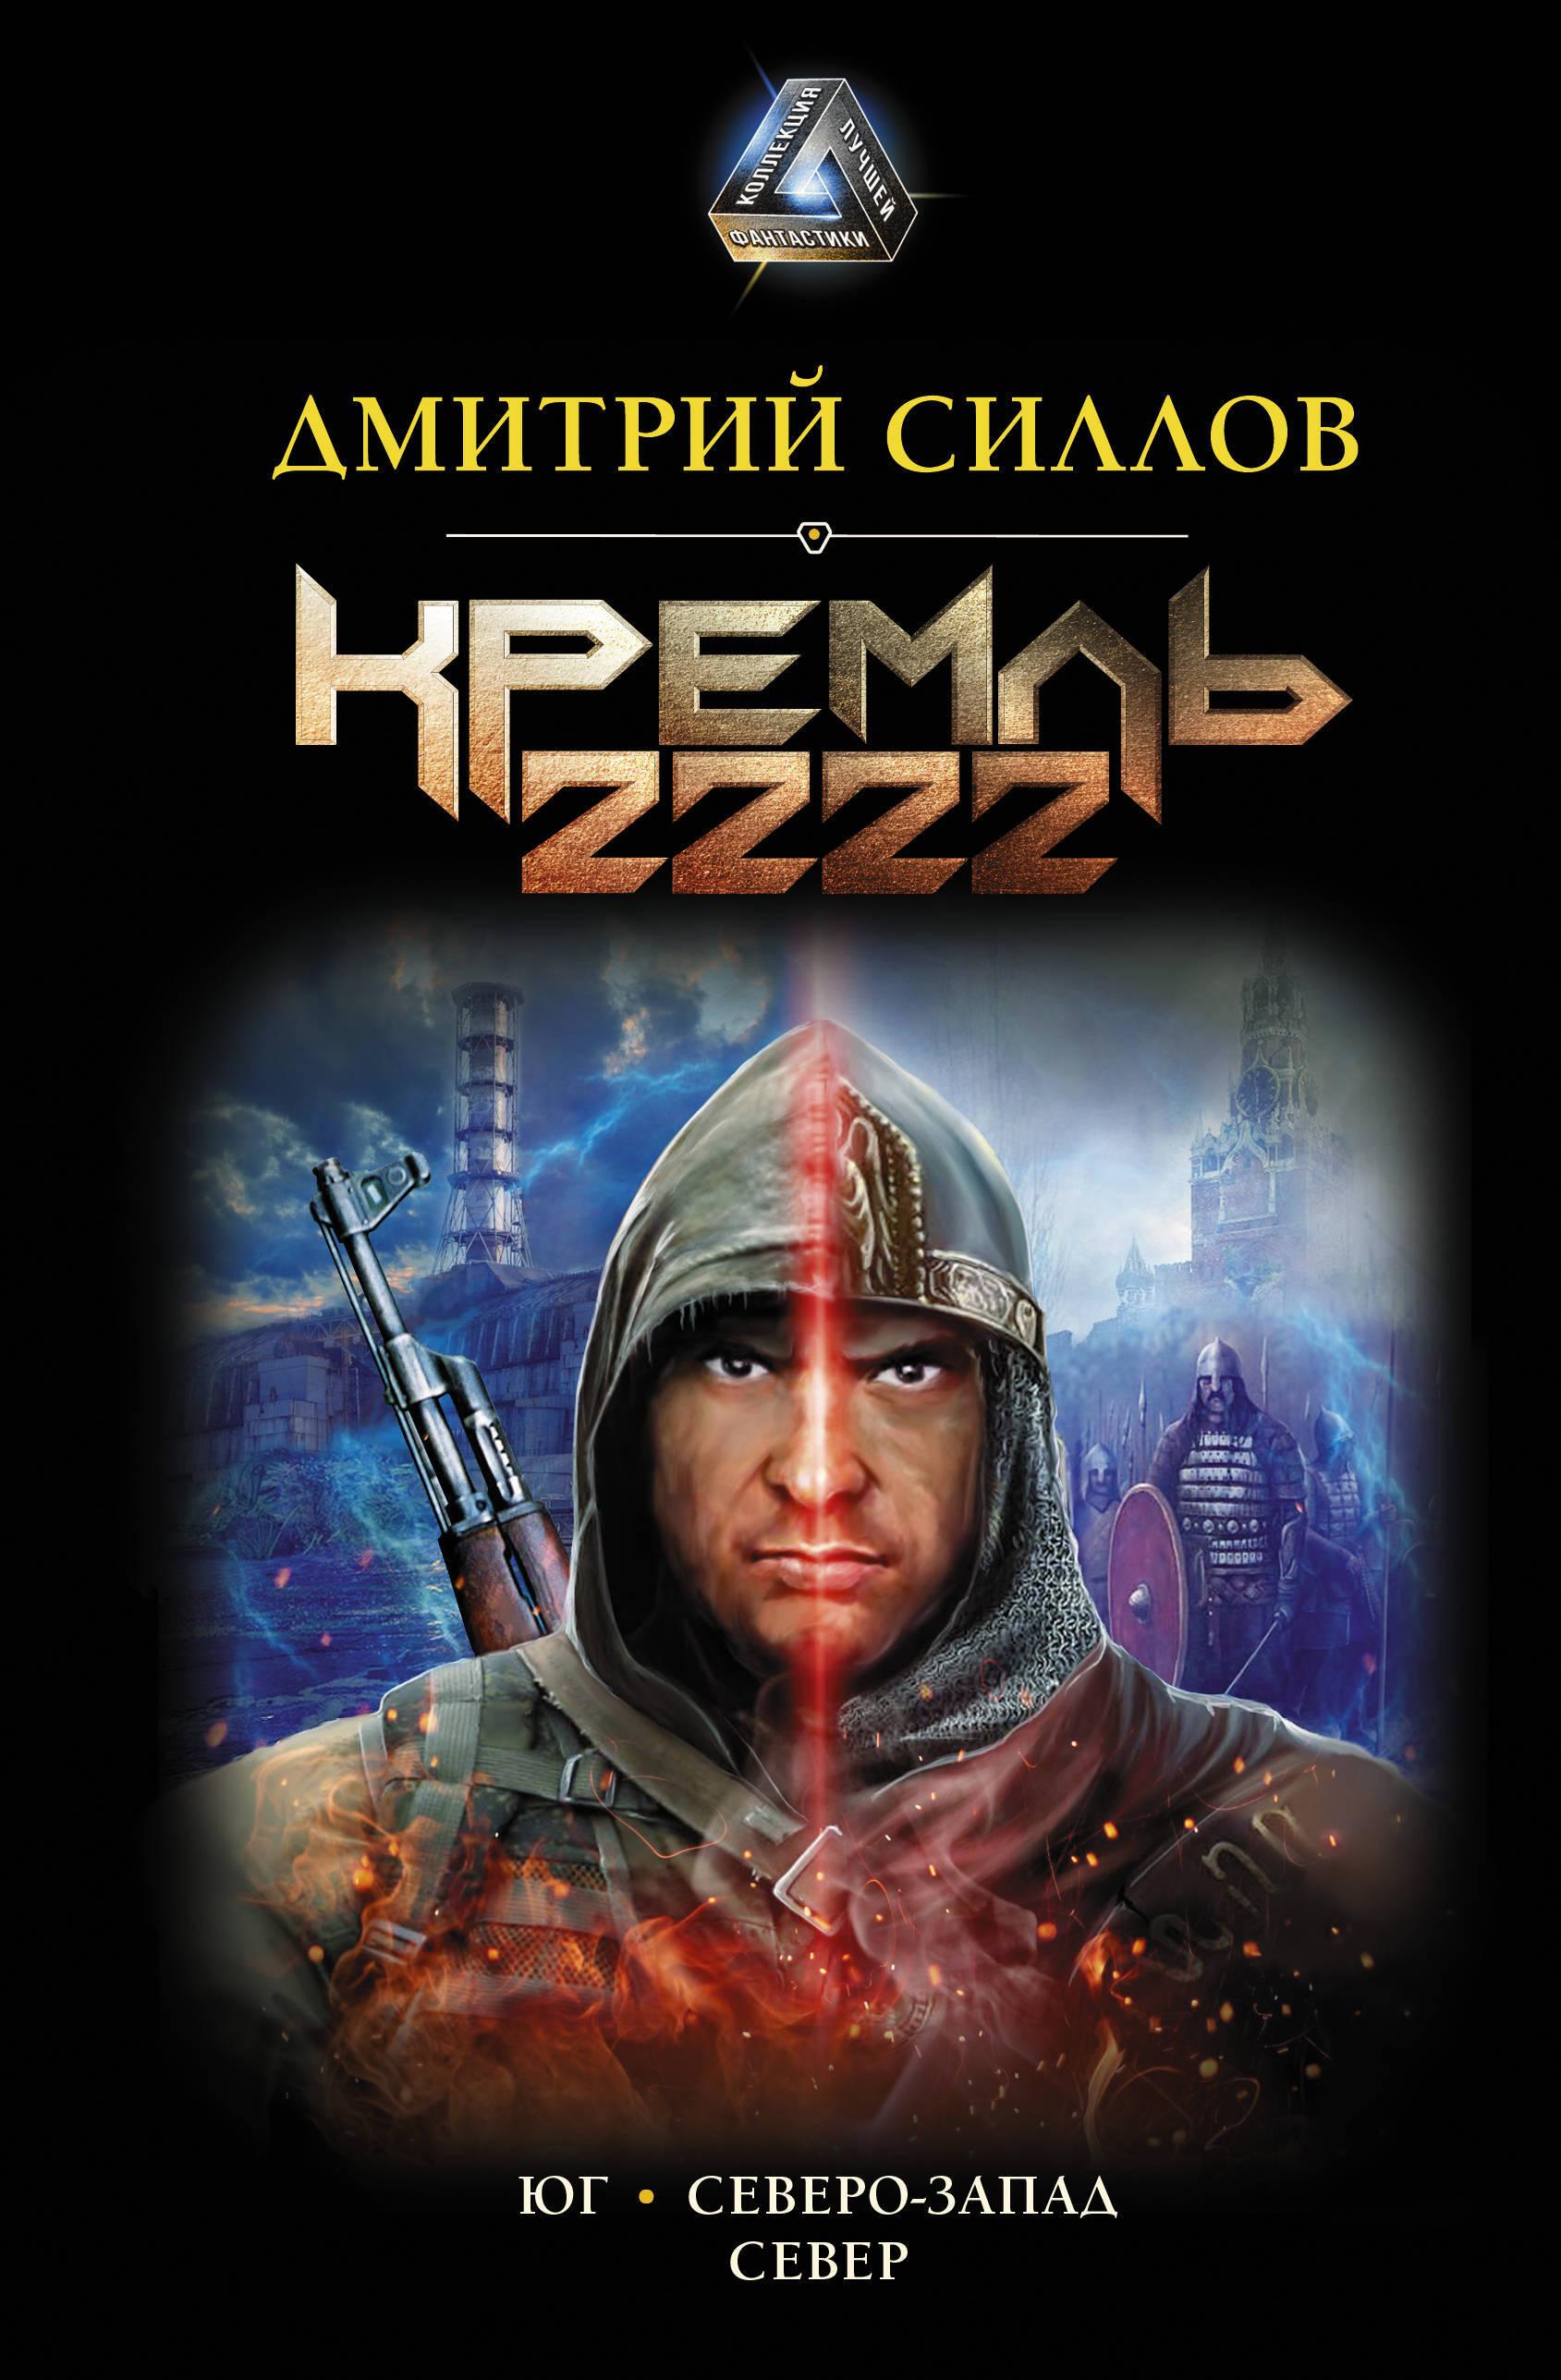 Кремль 2222 | Силлов Дмитрий Олегович